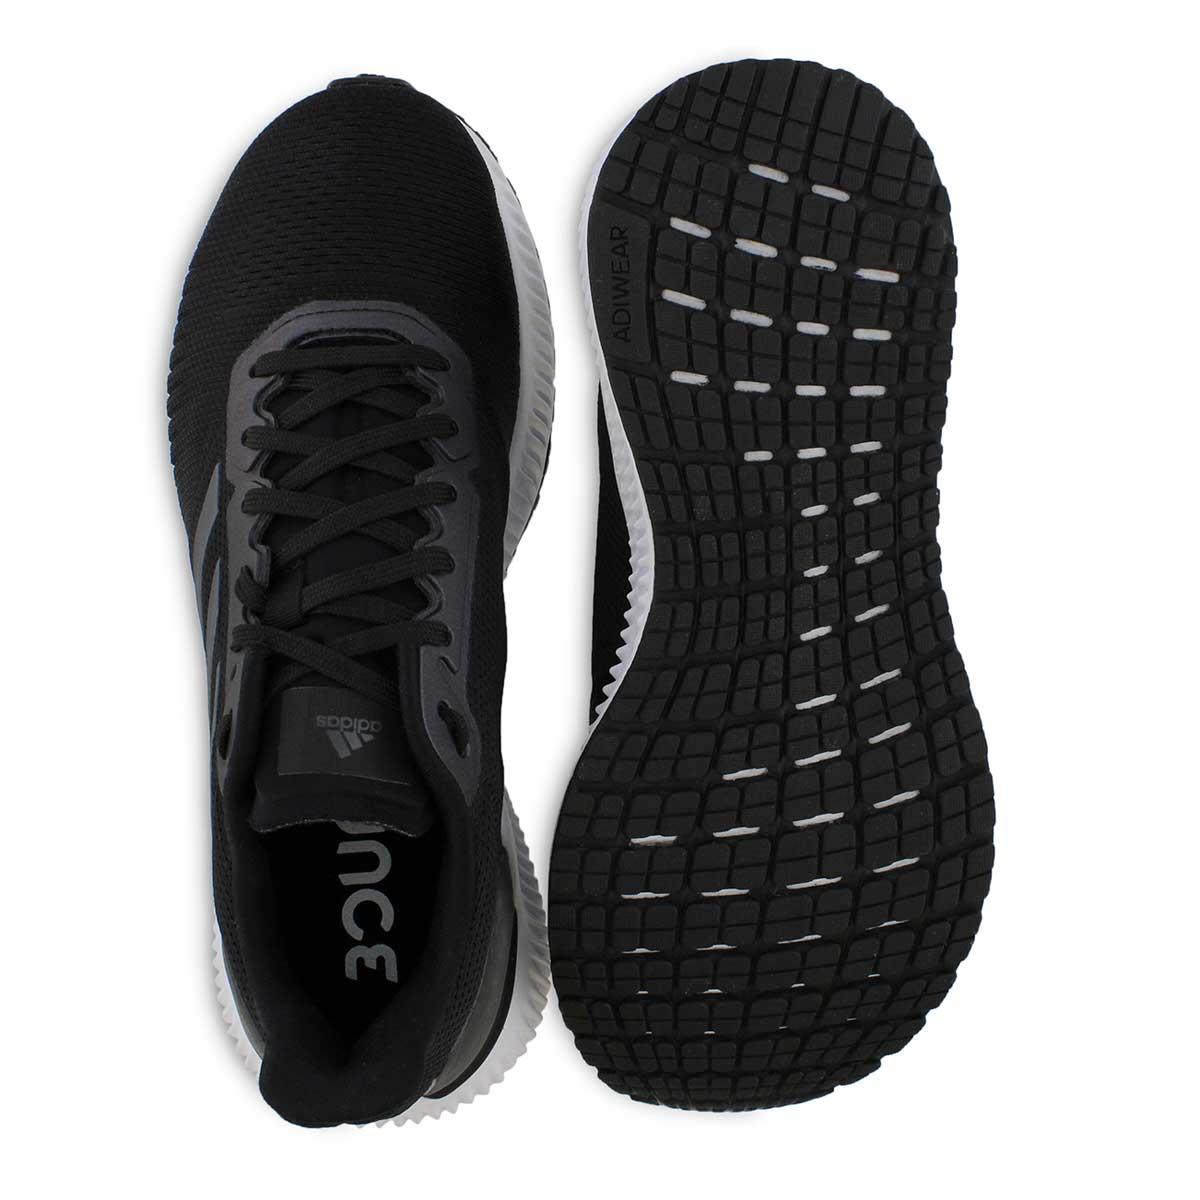 Lds Solar Ride W bk/gry/wht running shoe